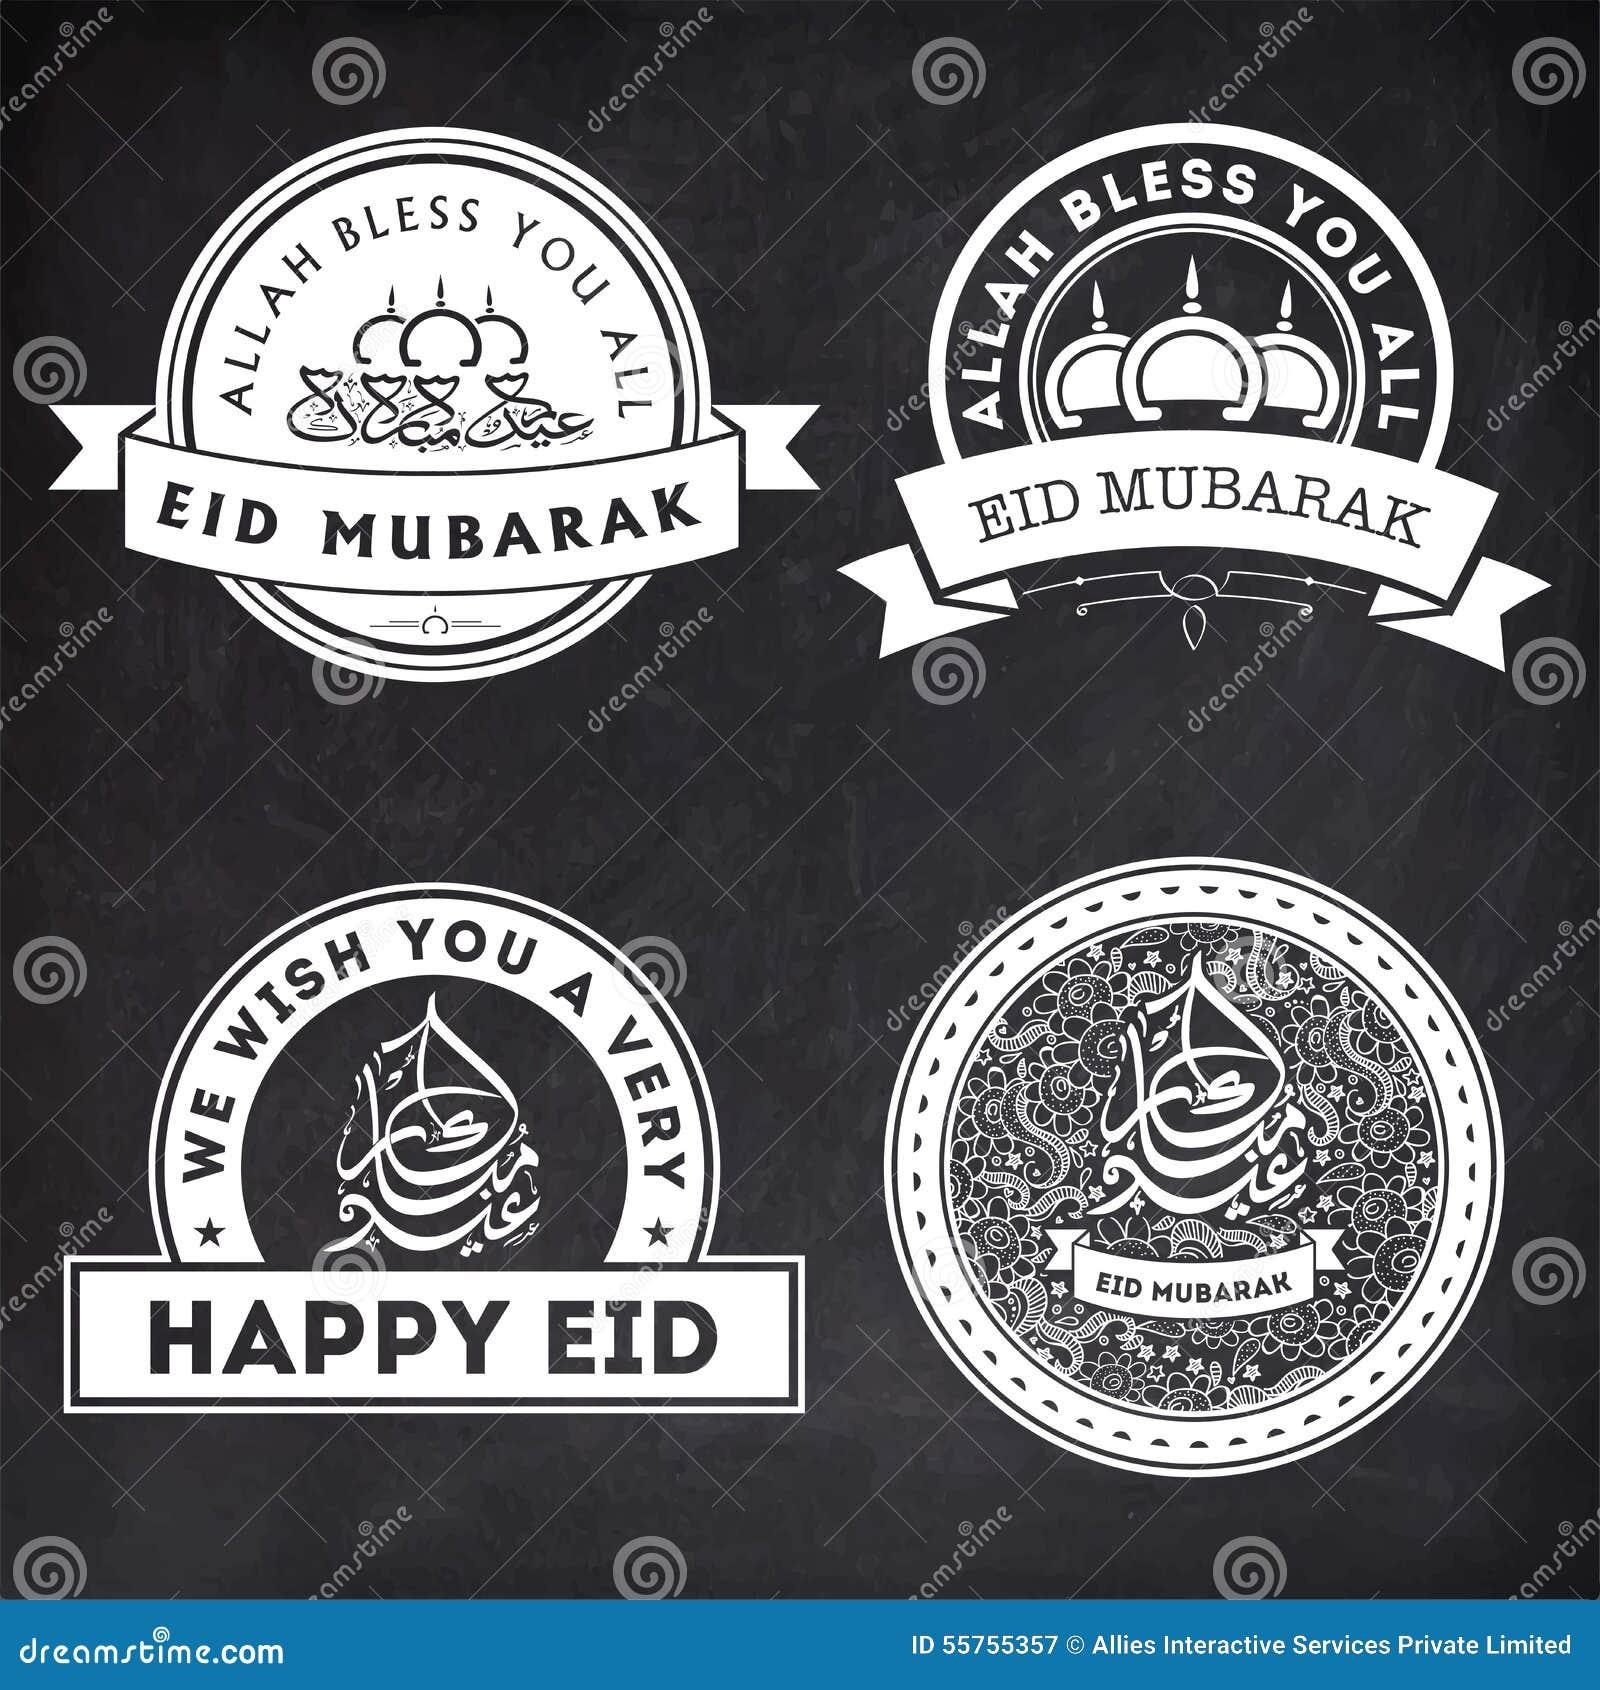 Eid Mubarak Stickers: Set Of Stickers Or Labels For Eid Mubarak. Stock Photo